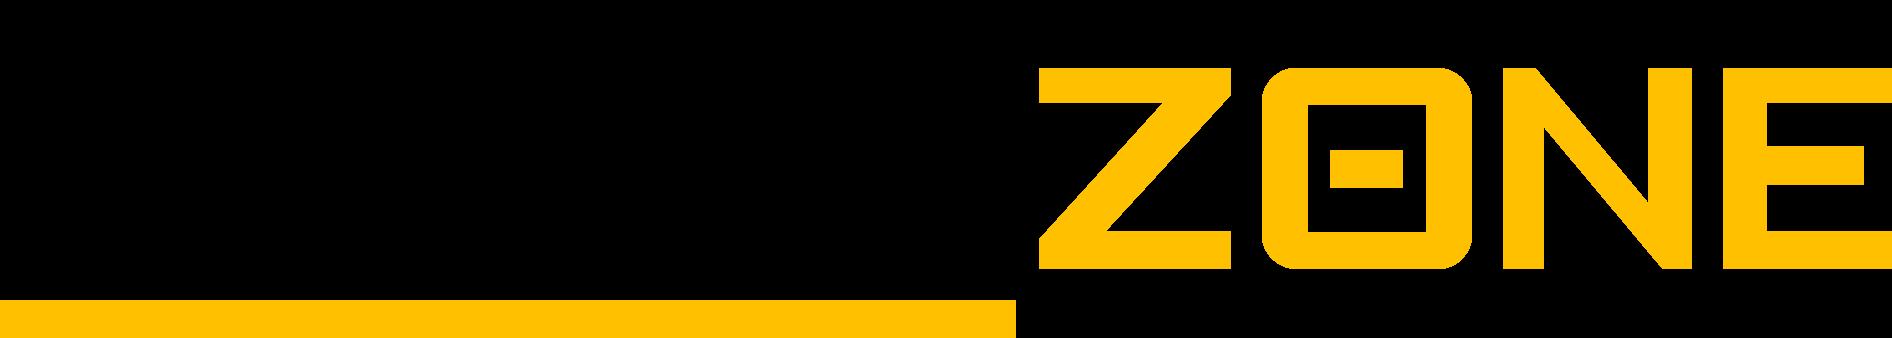 Petalzone